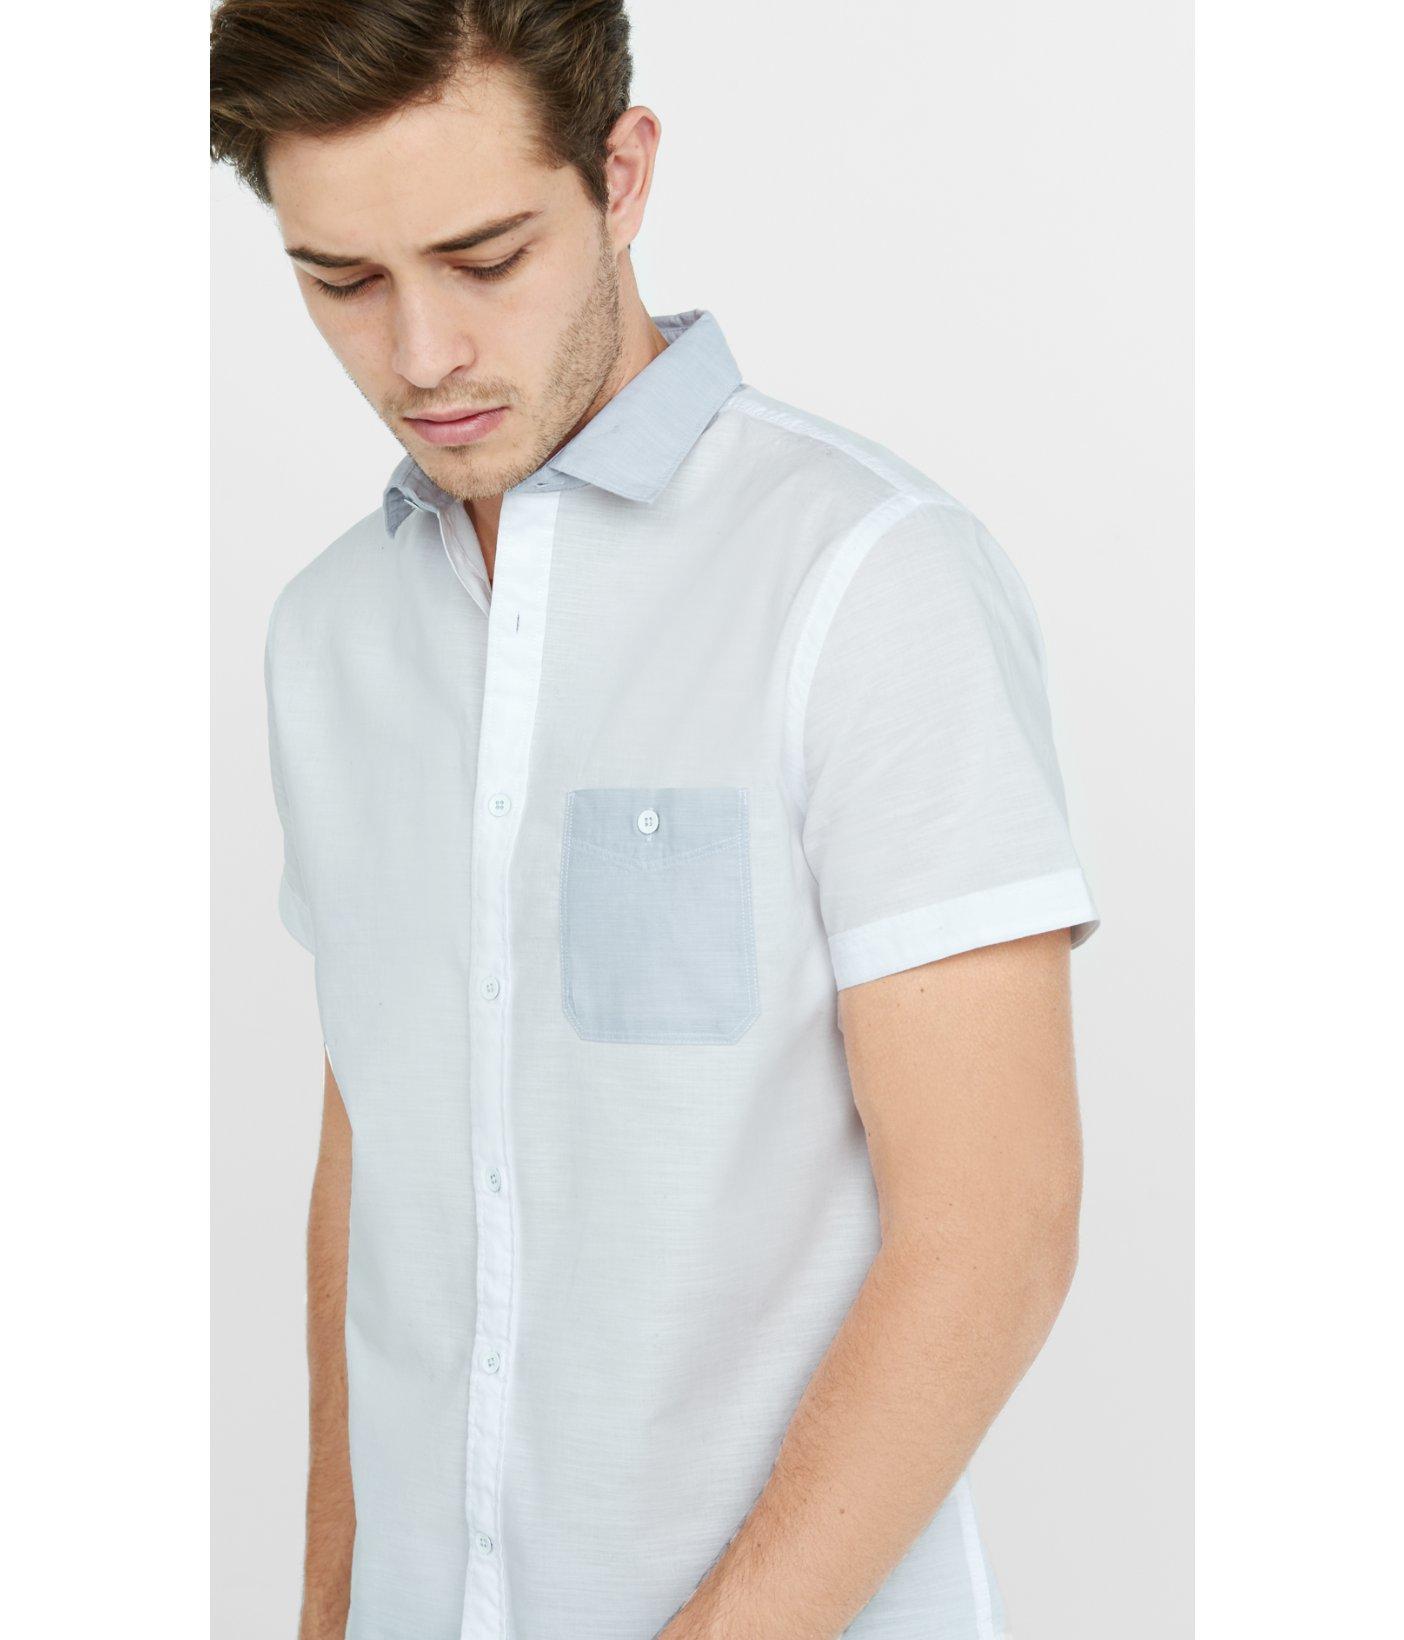 Express Short Sleeve Color Block Slub Chambray Shirt In